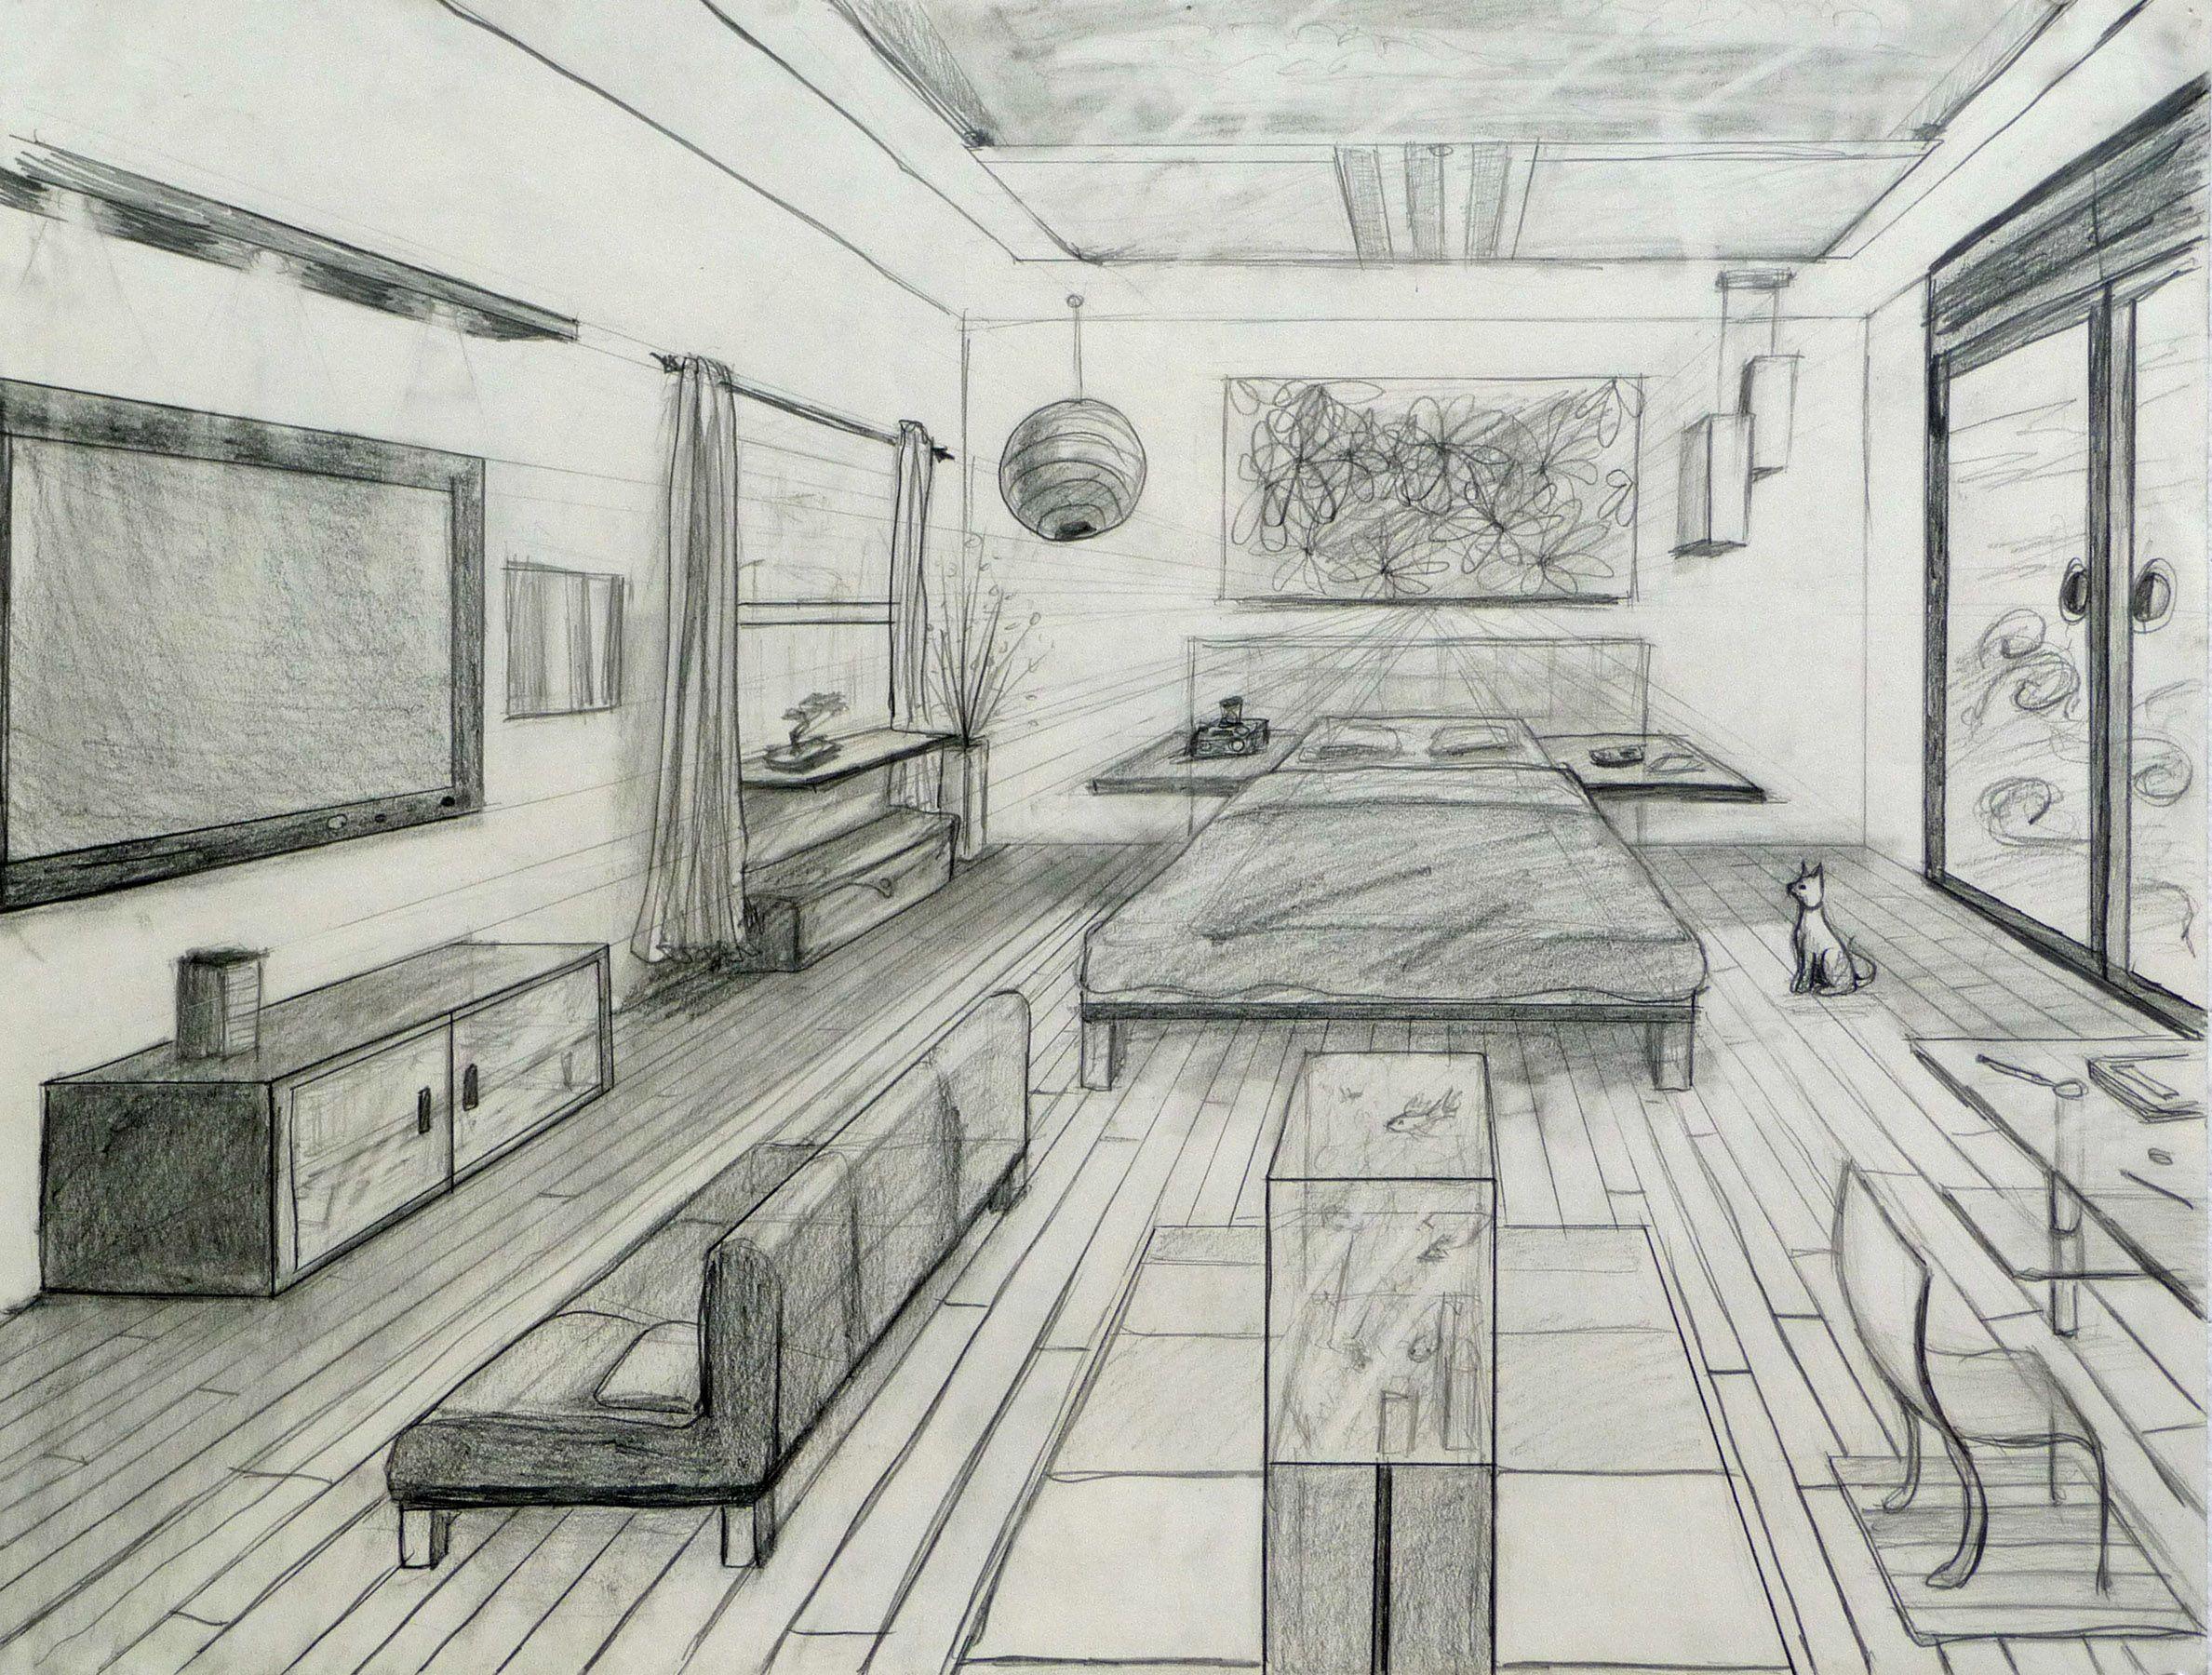 3d Zimmer Zeichnen 3d zimmer zeichnen raum zeichnen